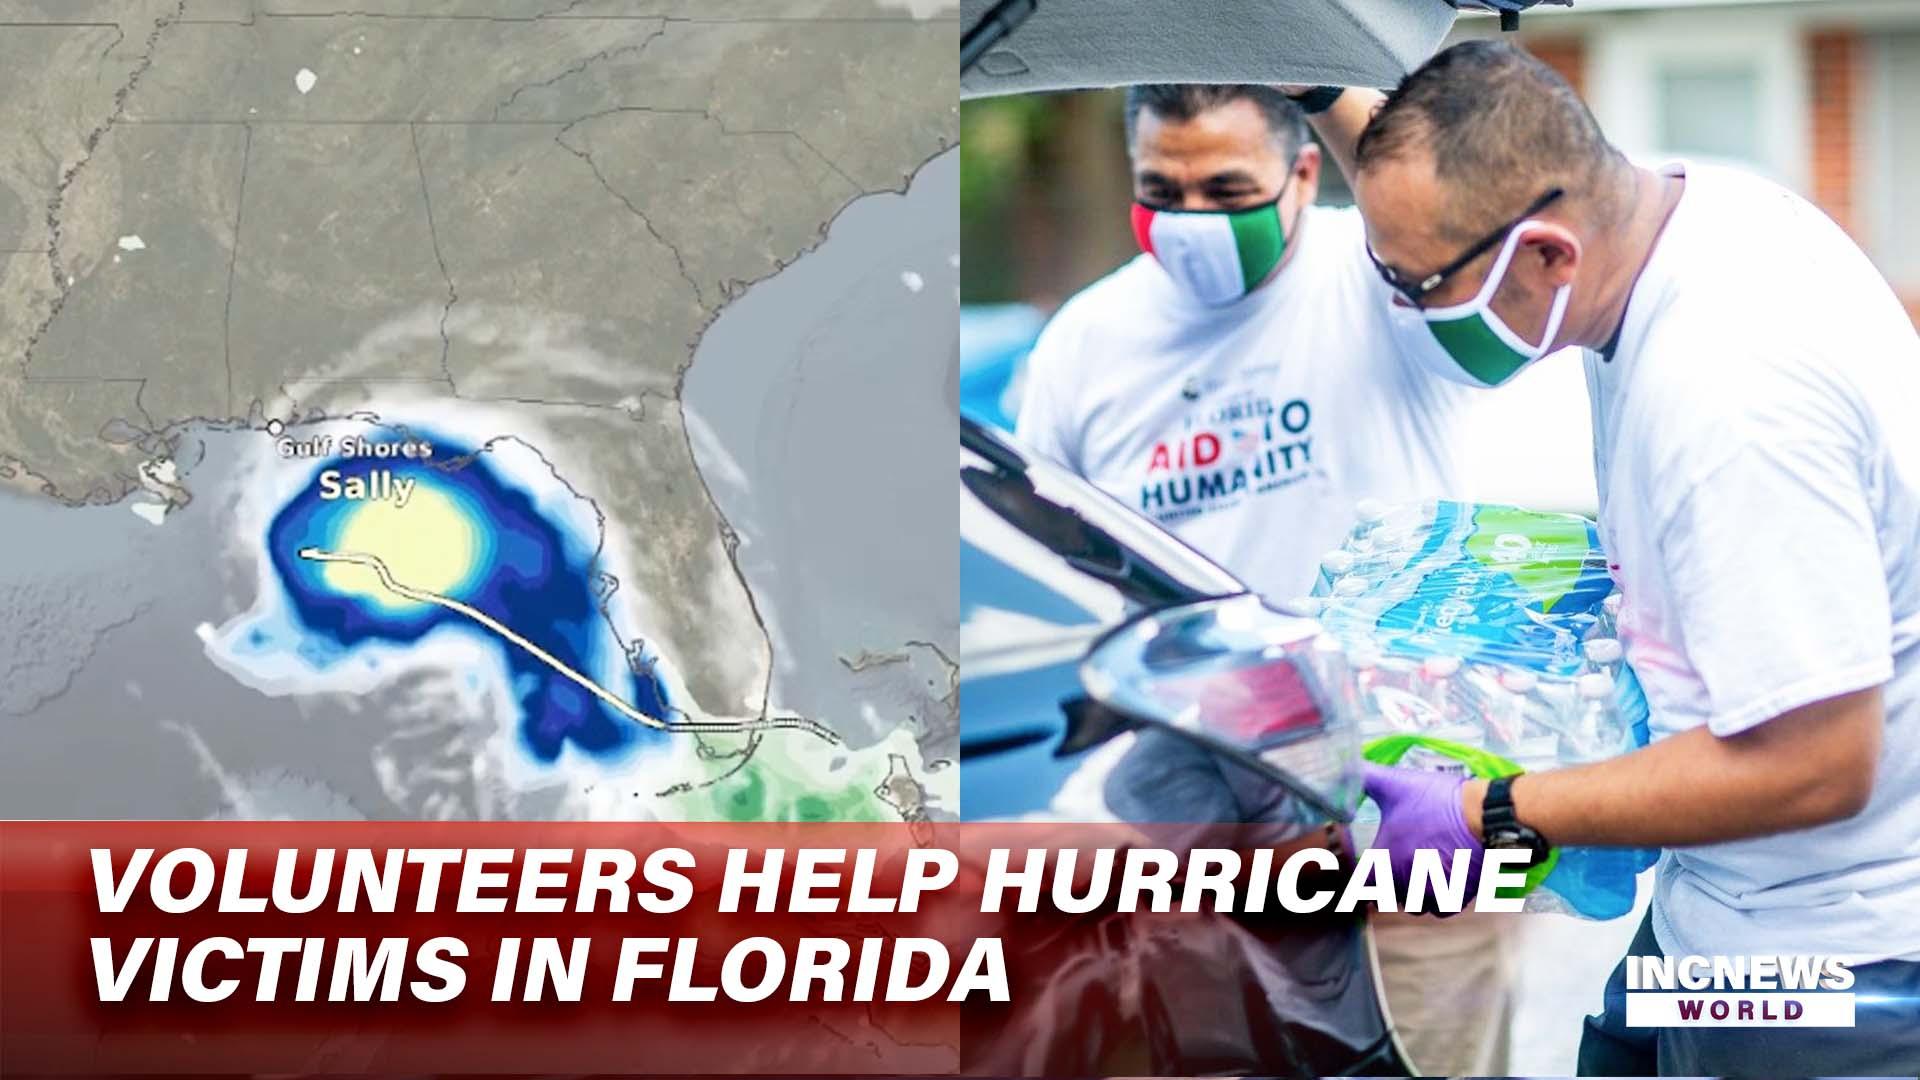 Volunteers Help Hurricane Victims in Florida